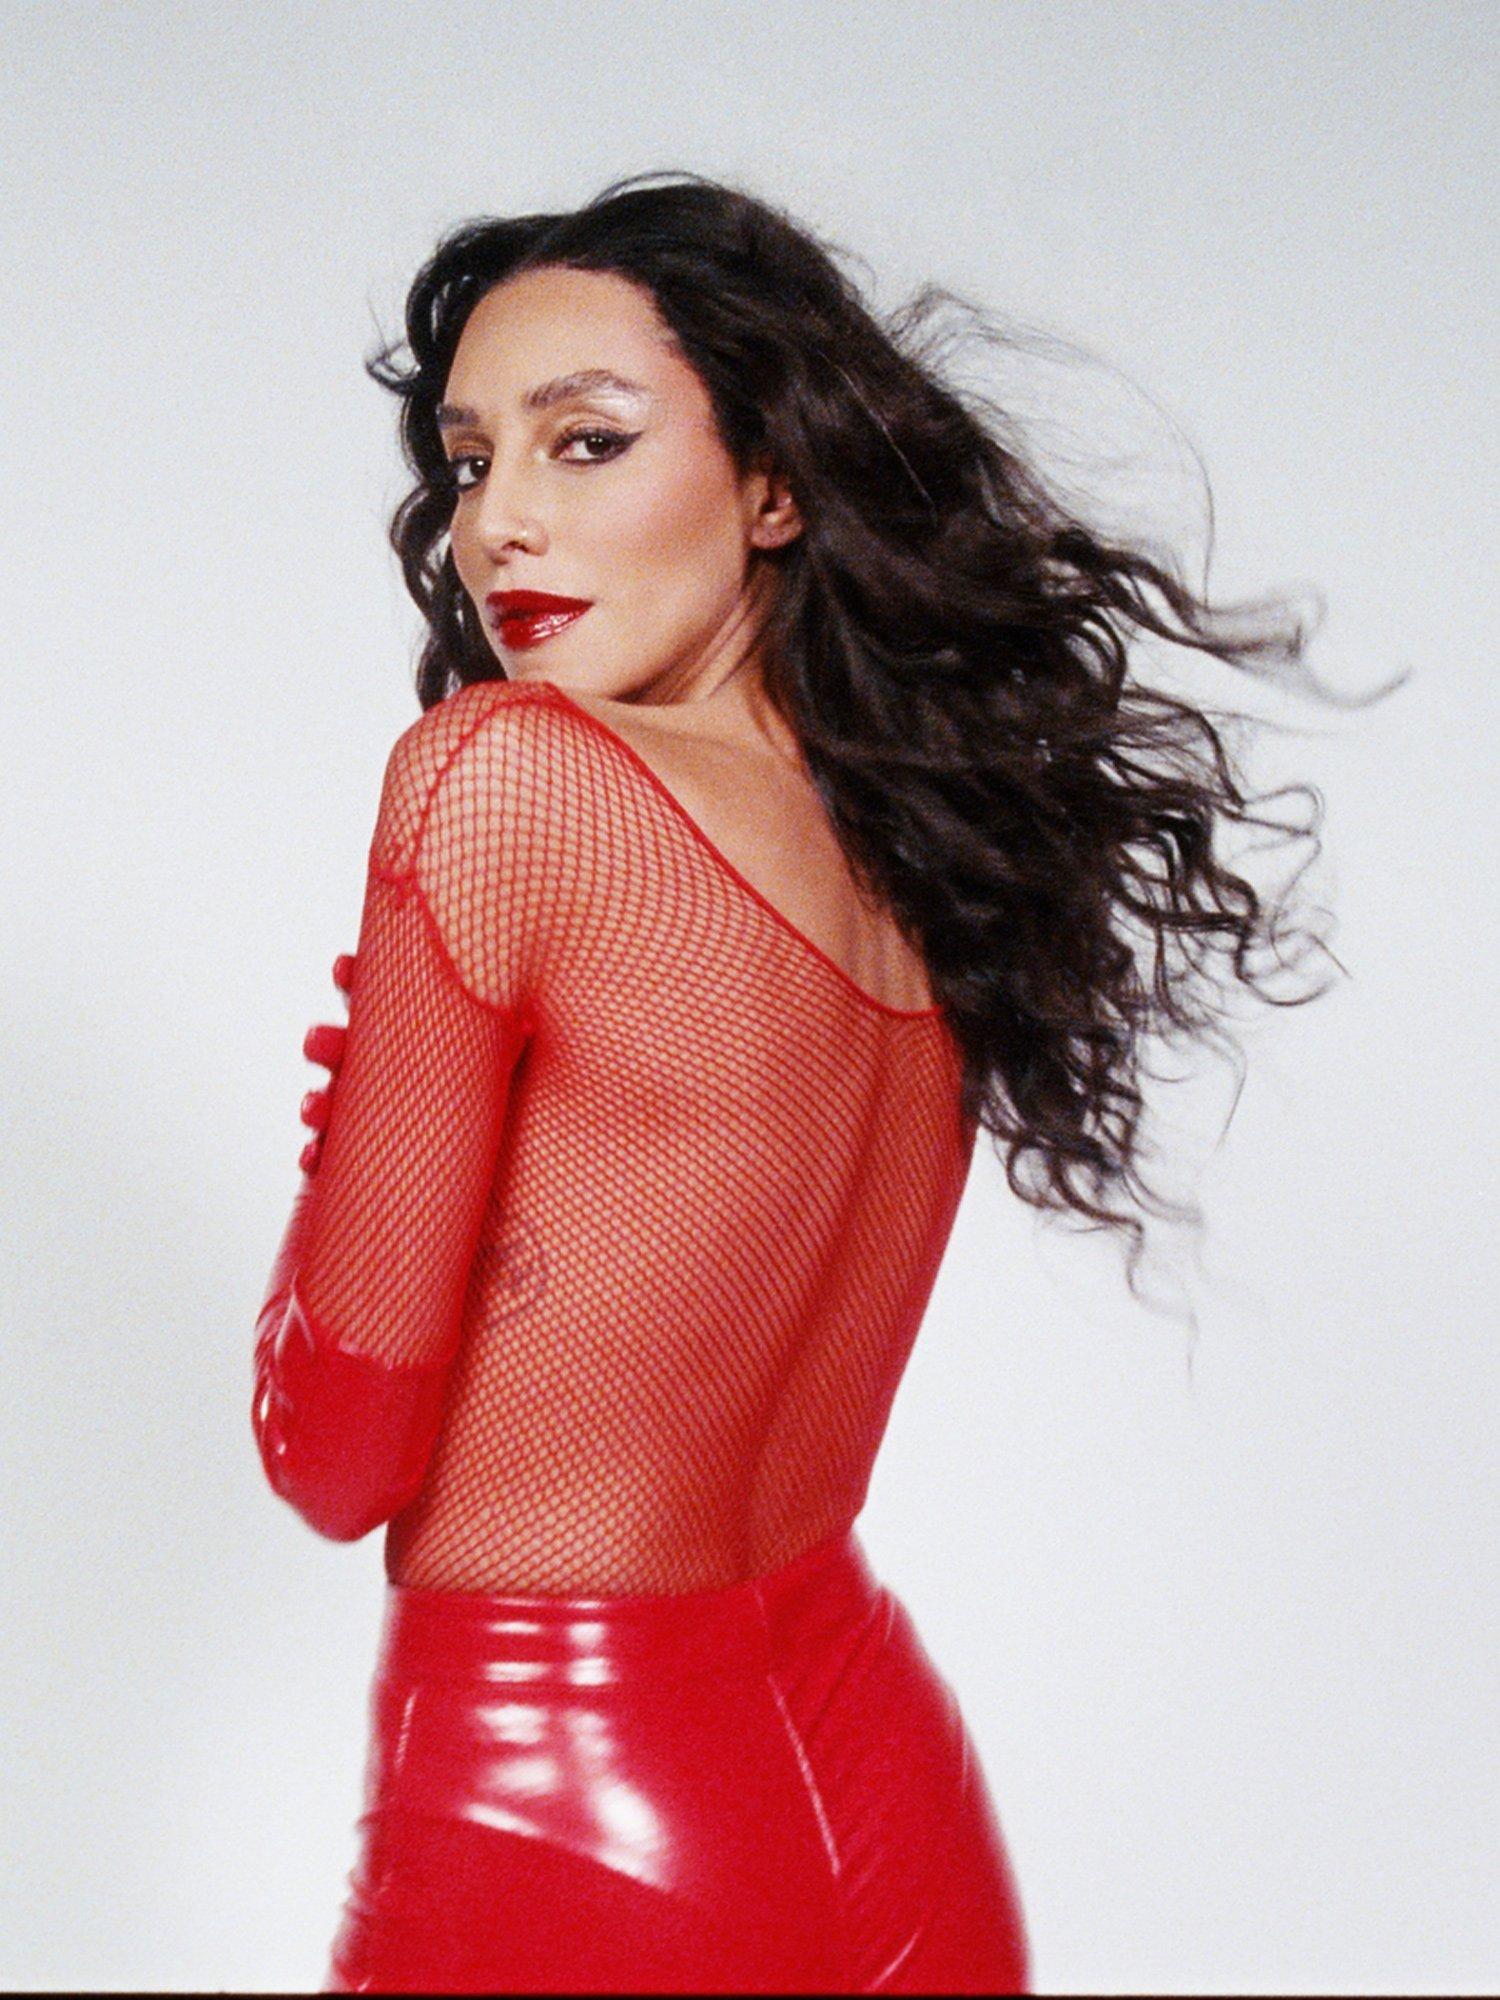 Lea T wearing Mac Viva Glam red lipstick for 25th Anniversary campaign, by RoAndCo Studio